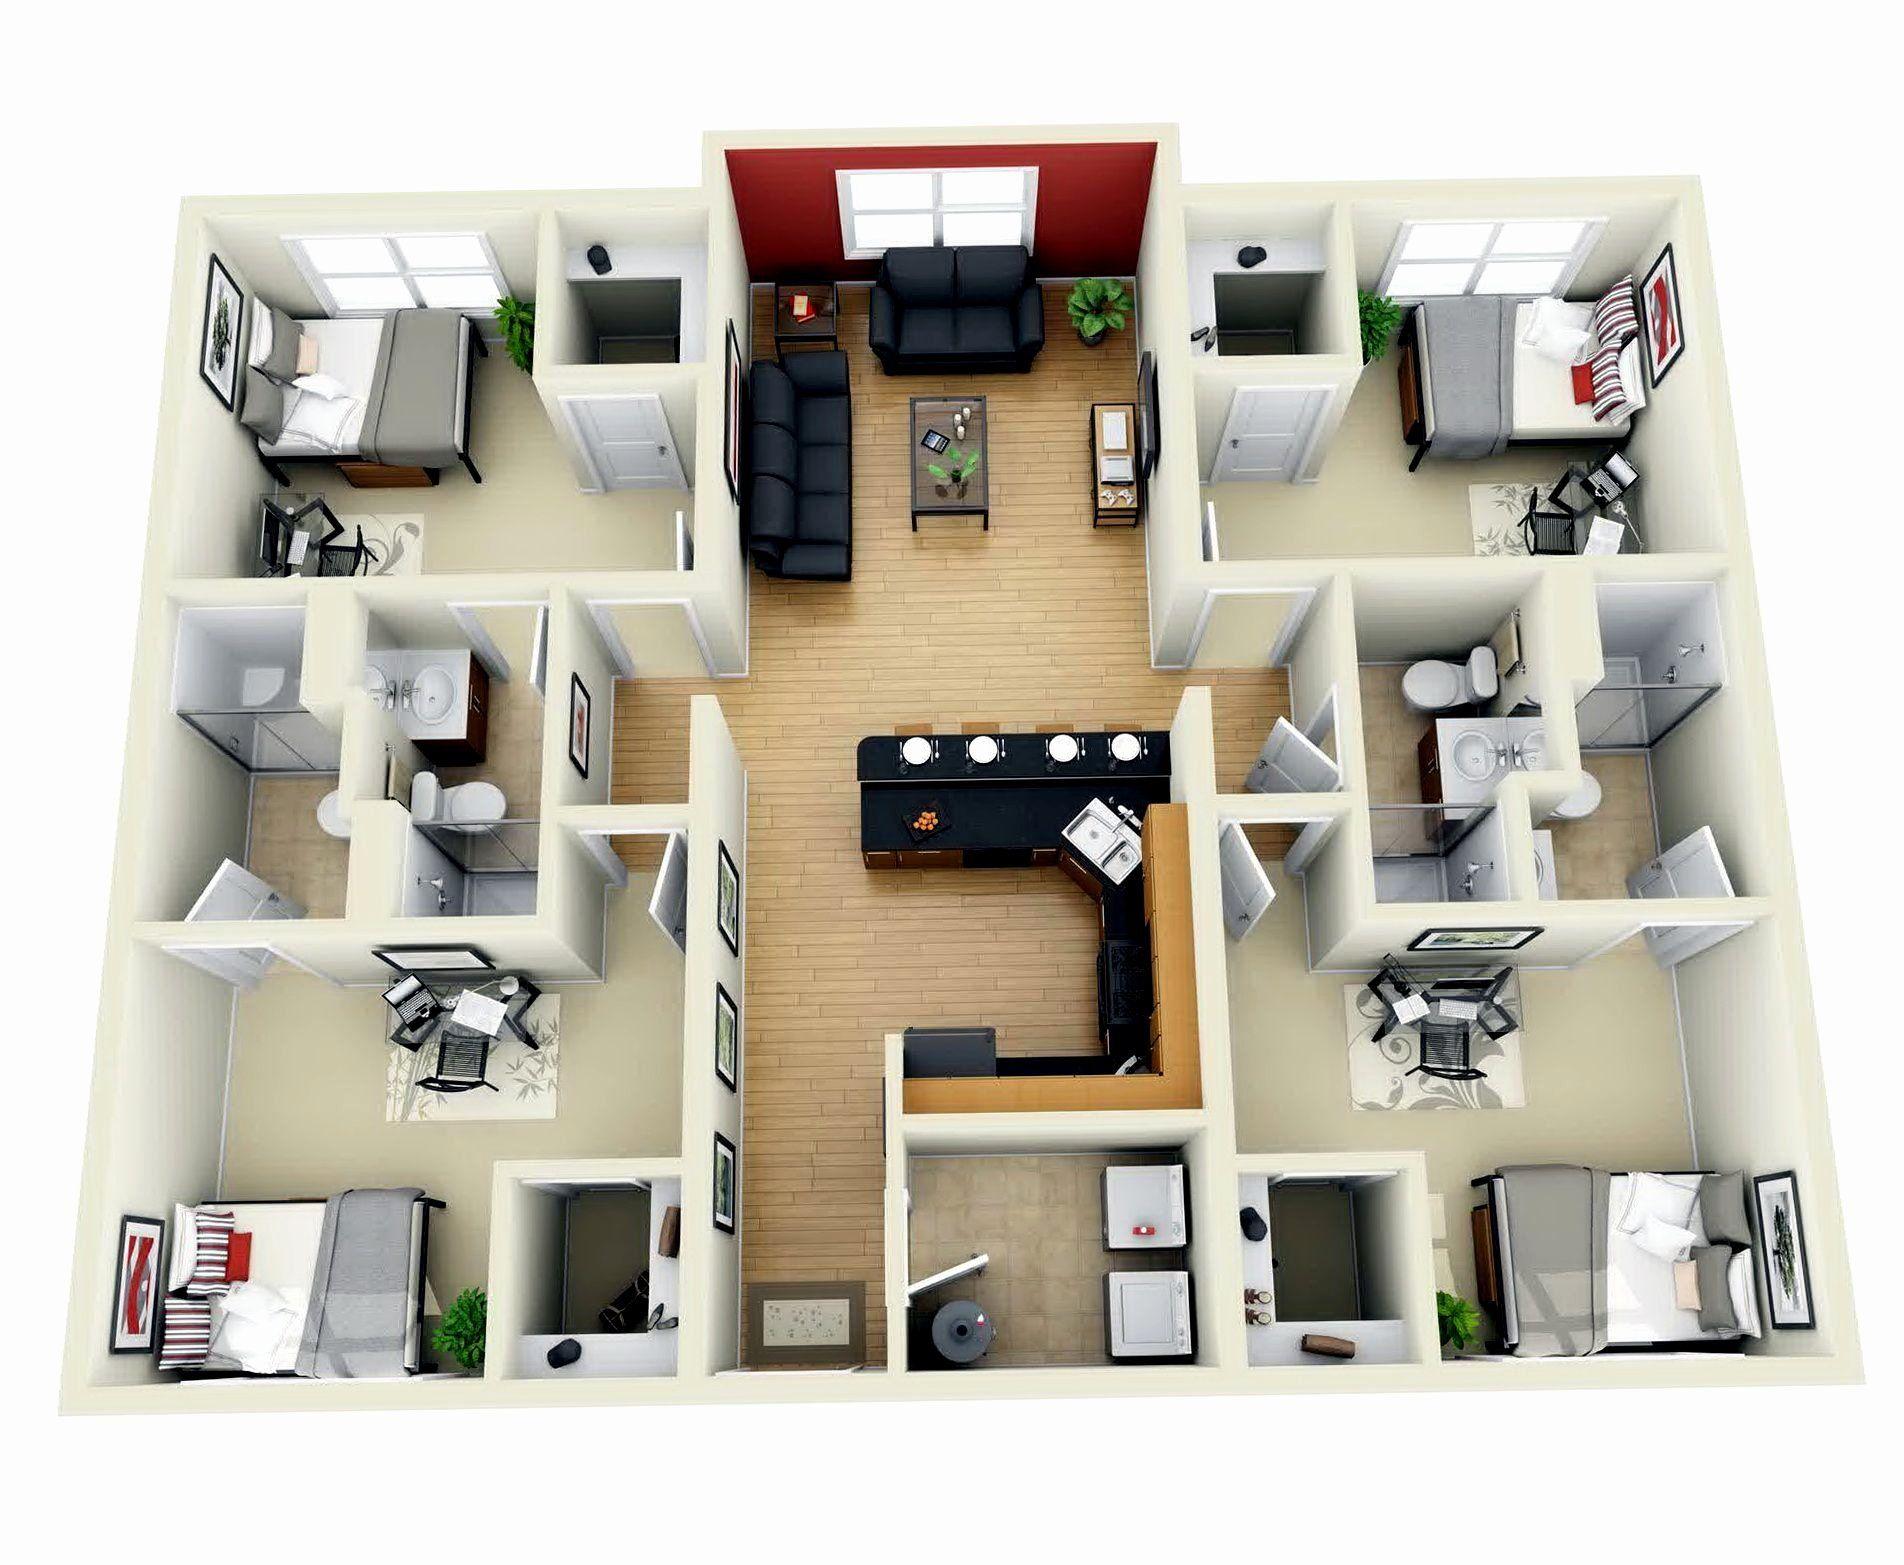 3d 4 Bedroom House Plans Elegant Download 4 Bedroom House Design 3d Adhome Plans 2 Bath 1 Islaminjap In 2020 Apartment Floor Plans Bedroom House Plans 3d House Plans